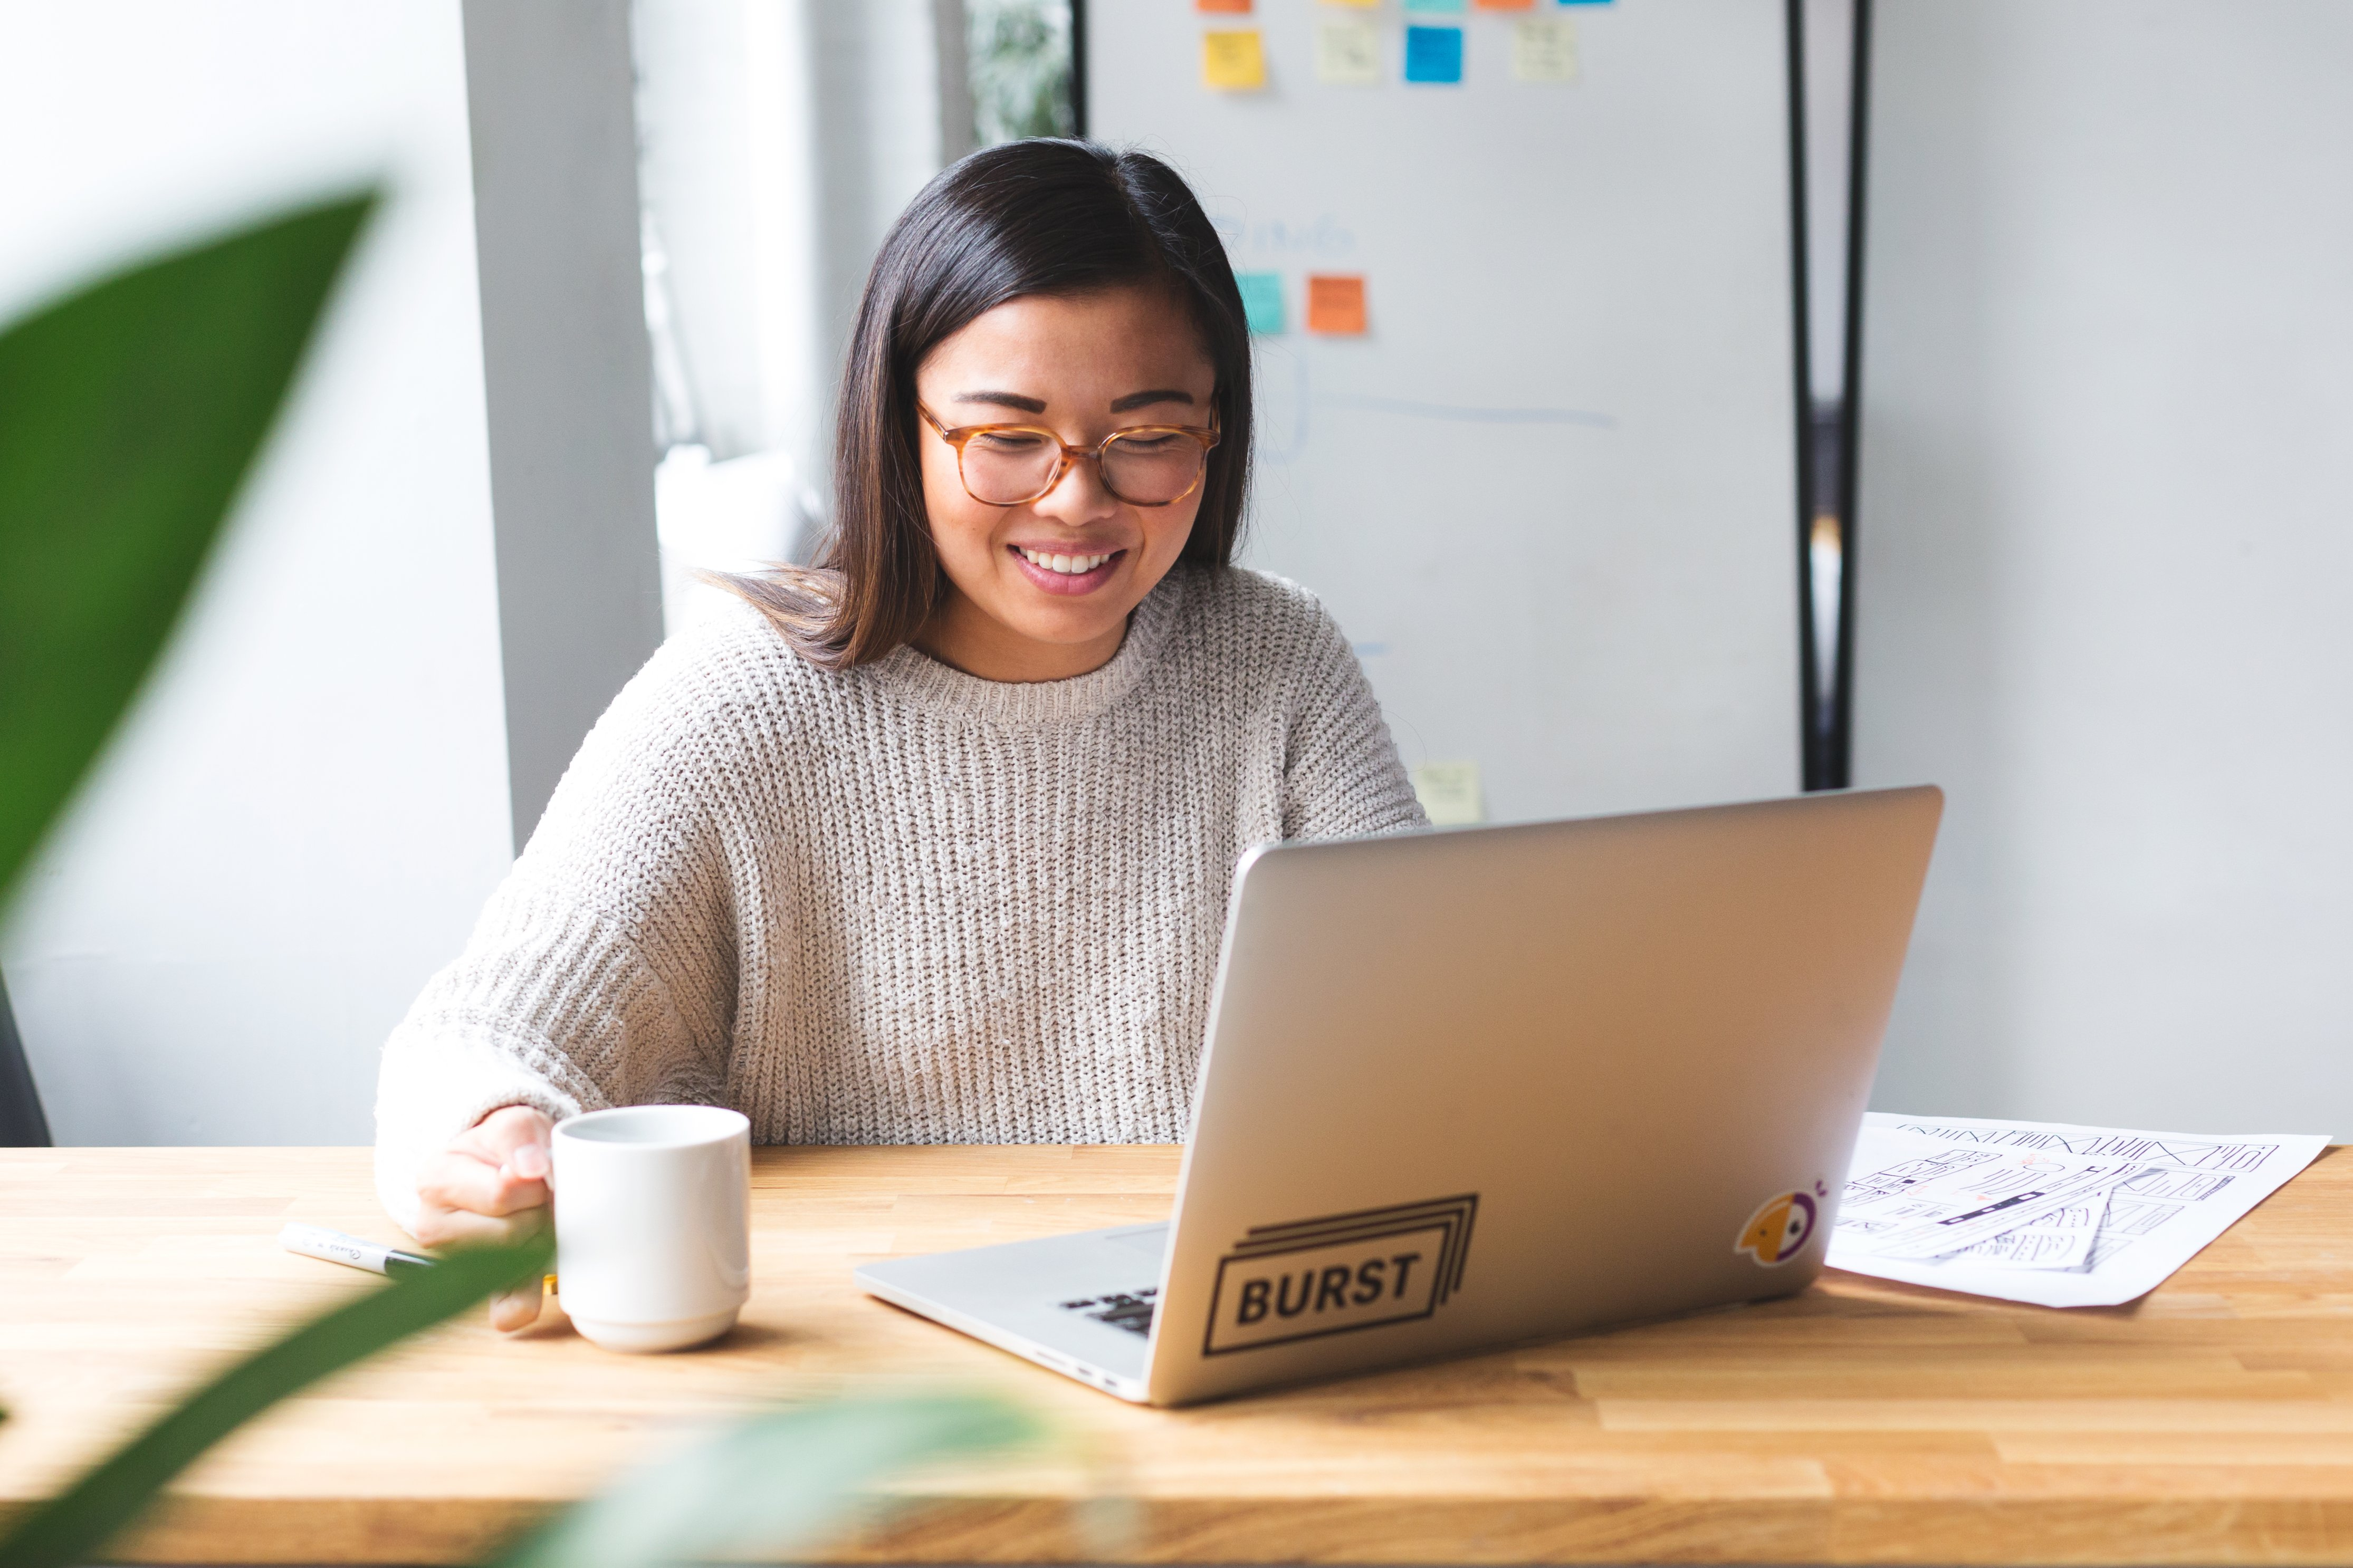 web-designer-starting-her-day